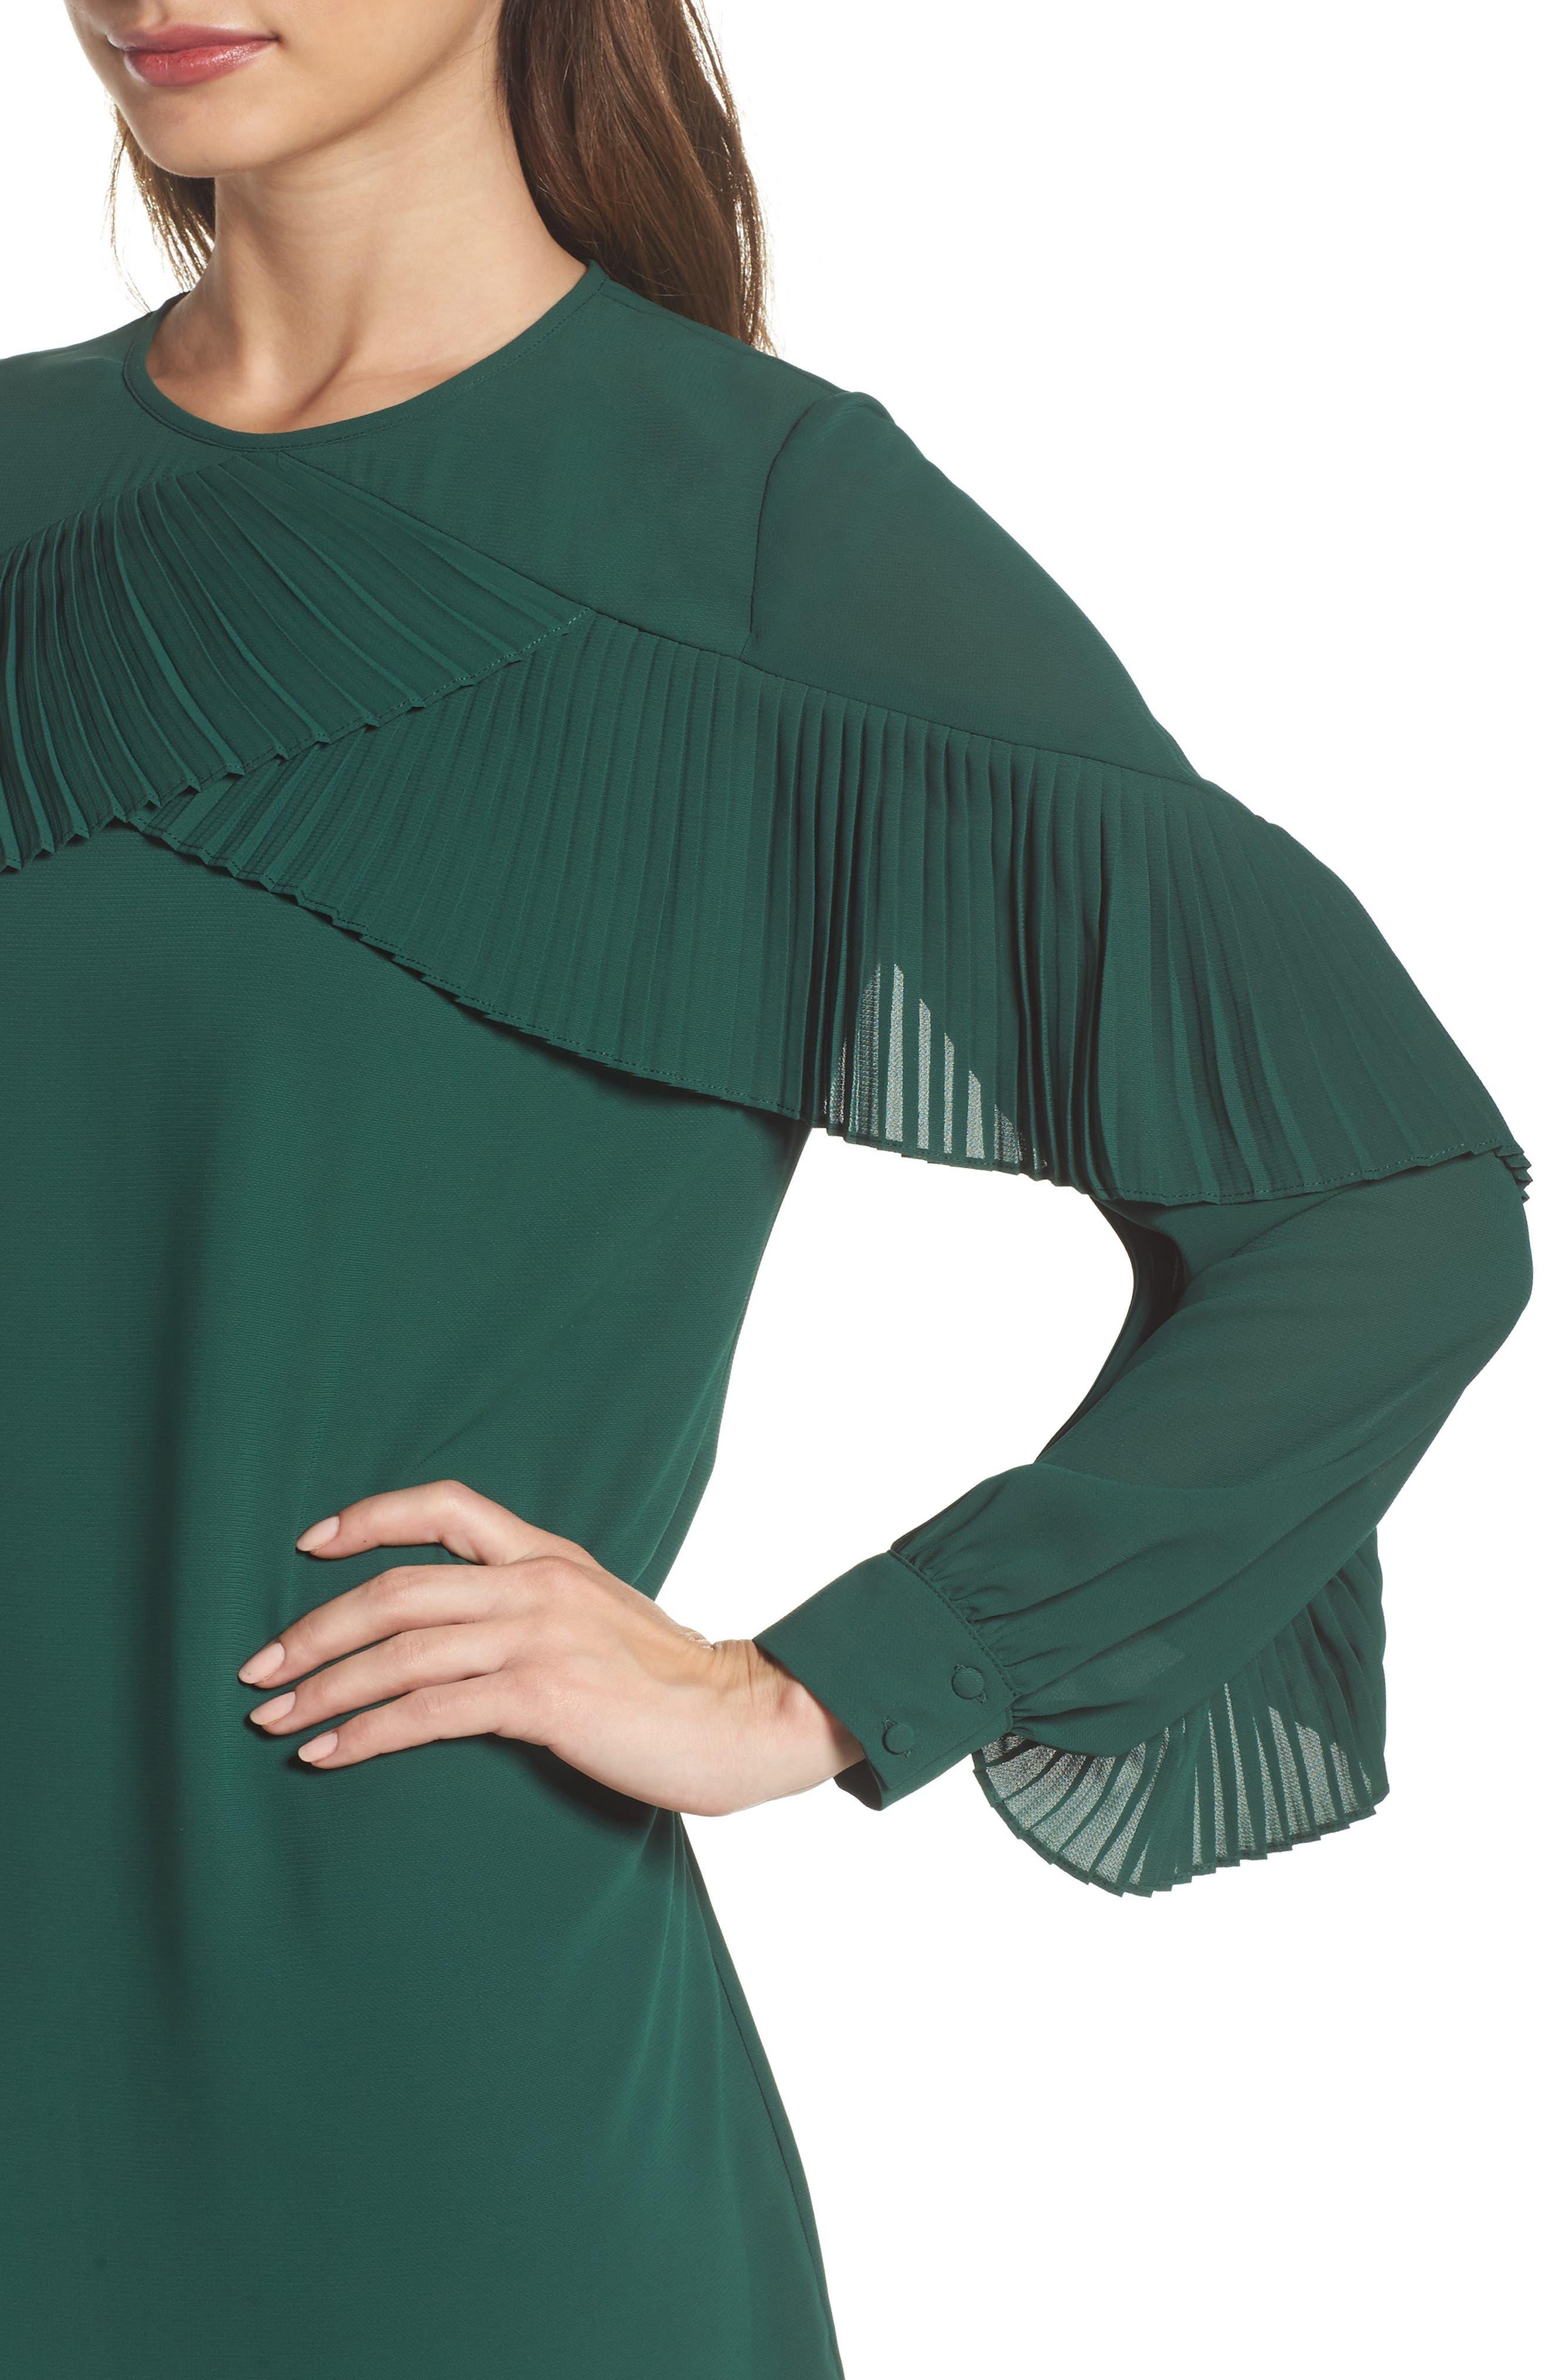 Ruffle Shift Dress,                             Alternate thumbnail 4, color,                             Green Evergreen